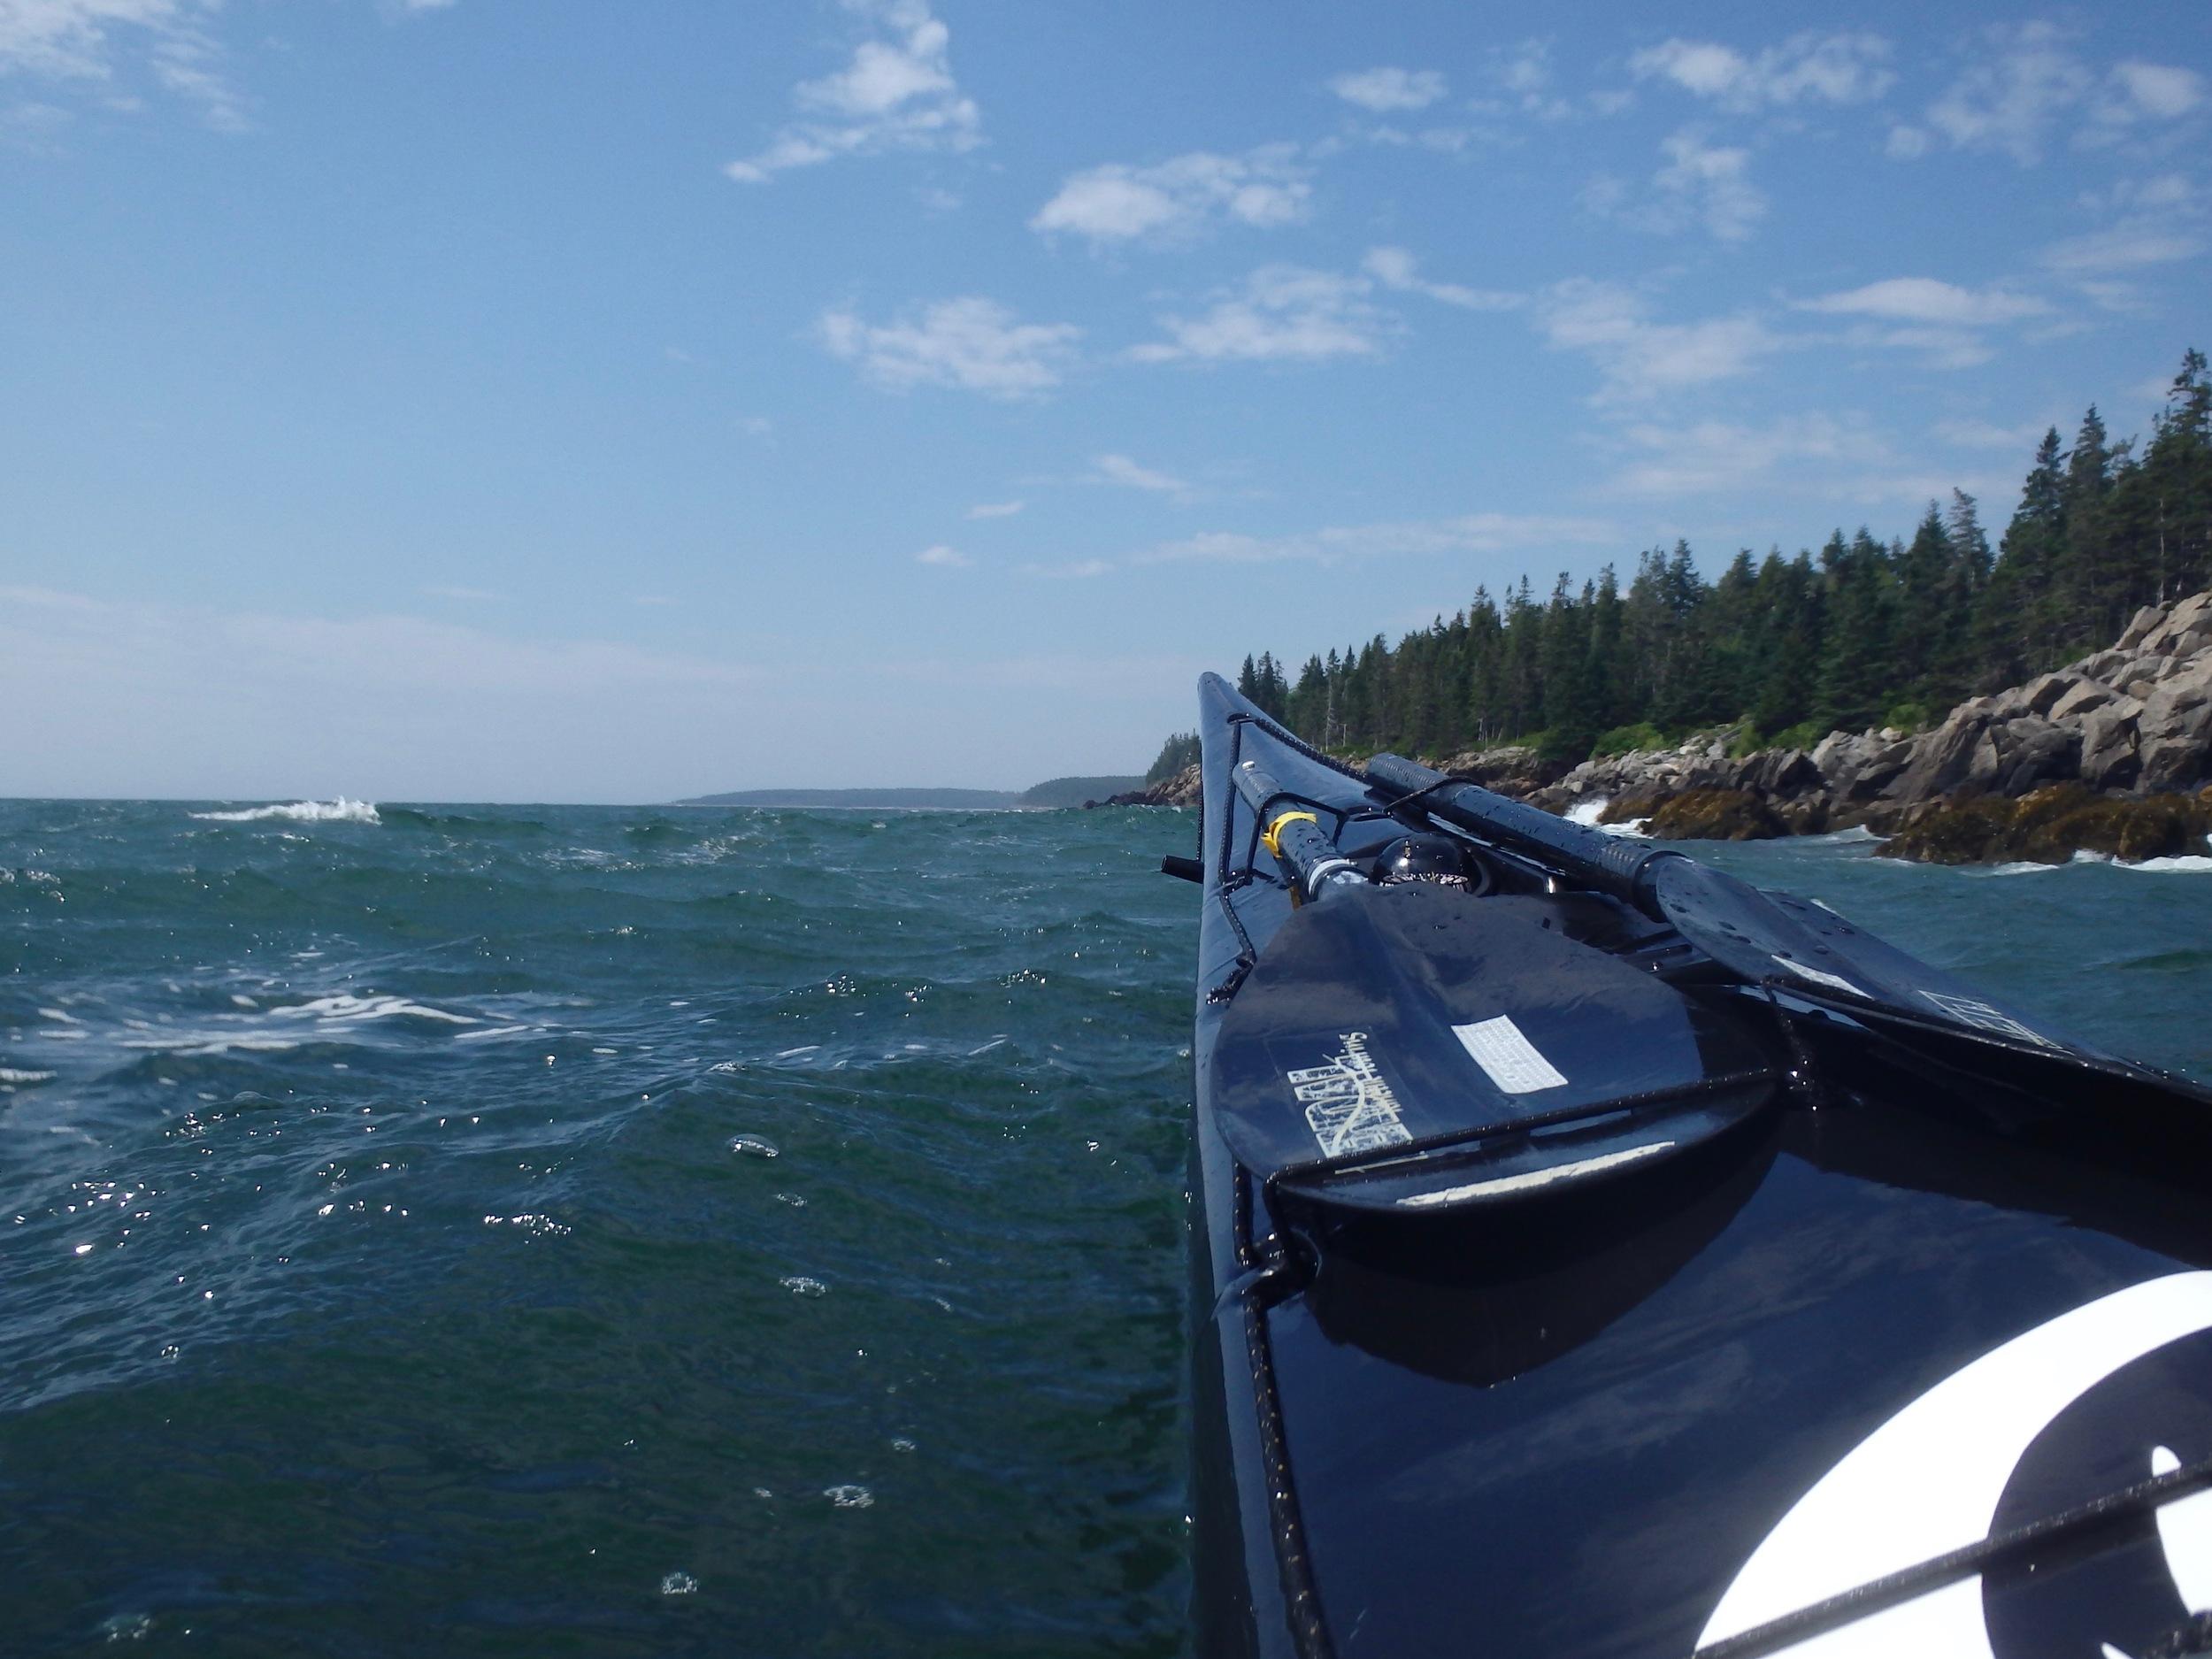 Moving along the coast